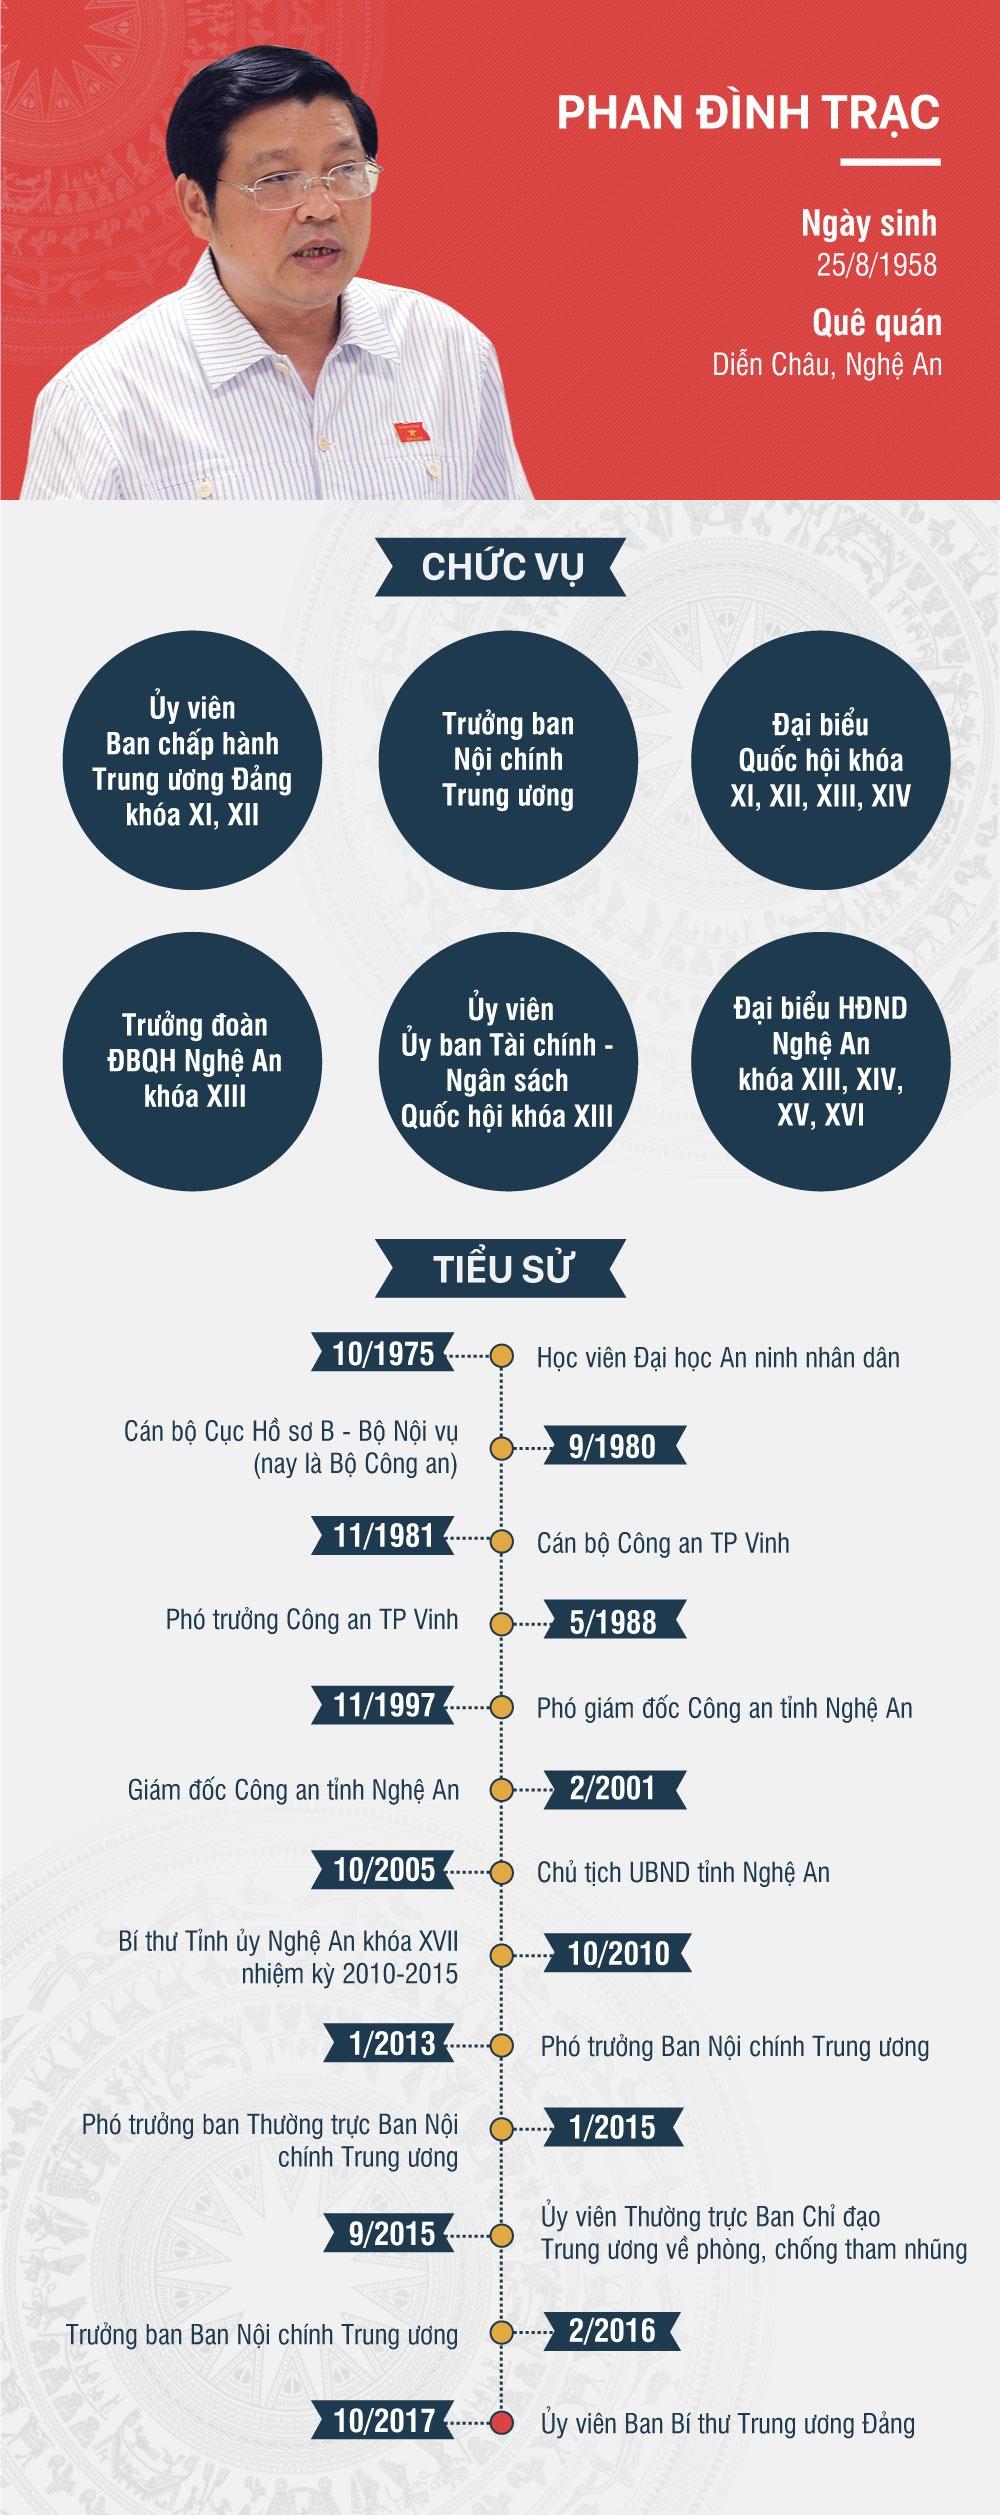 Chan dung 2 tan uy vien Ban Bi thu Trung uong Dang hinh anh 1